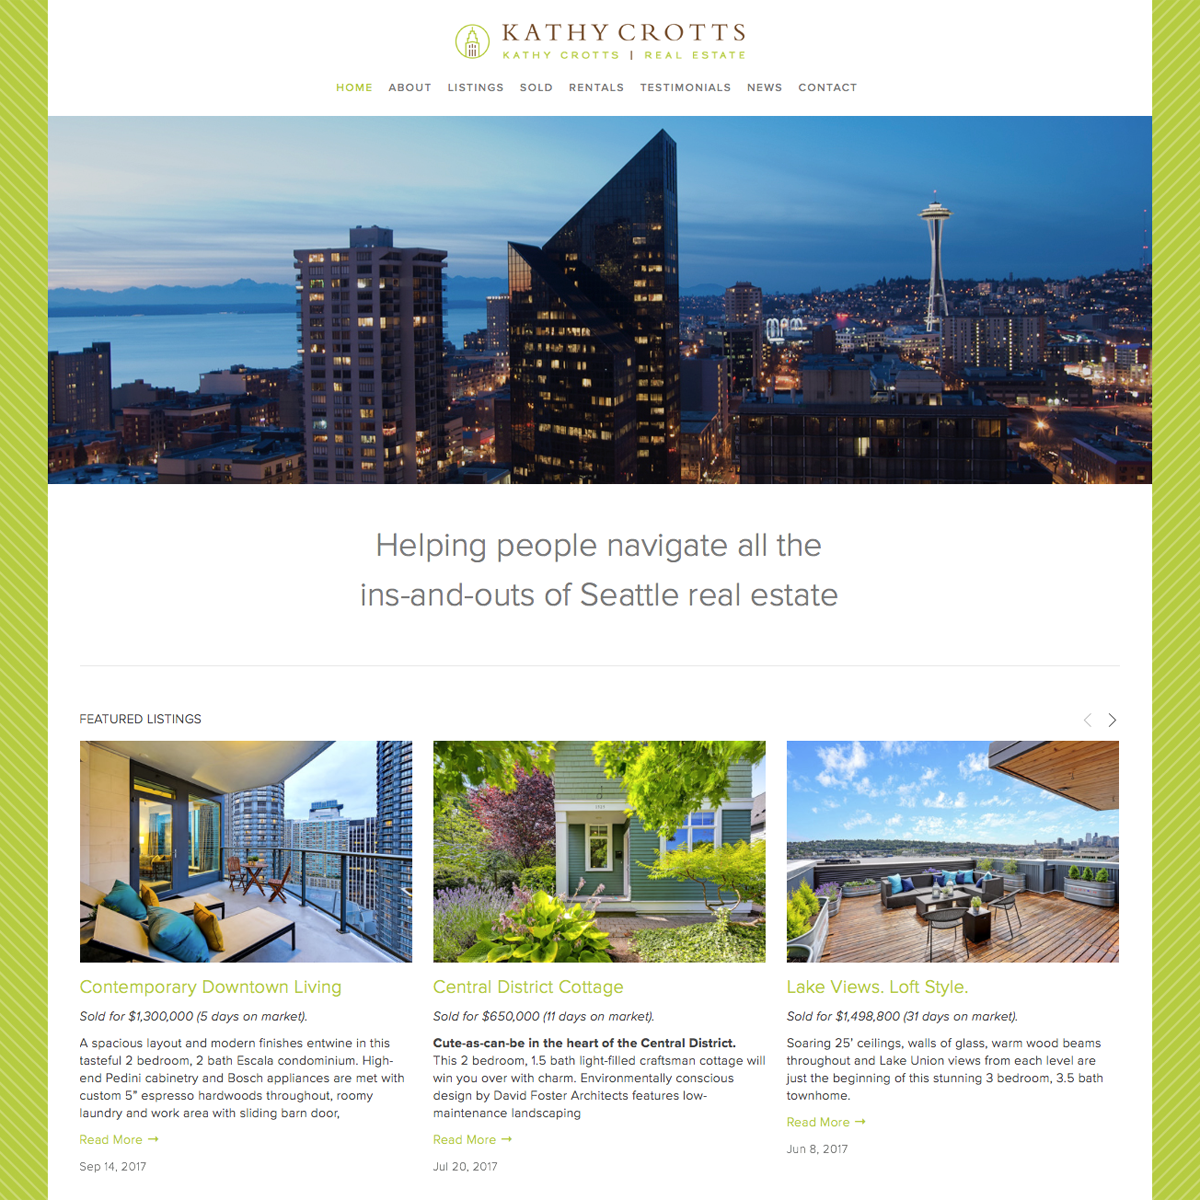 Kathy Crotts Real Estate